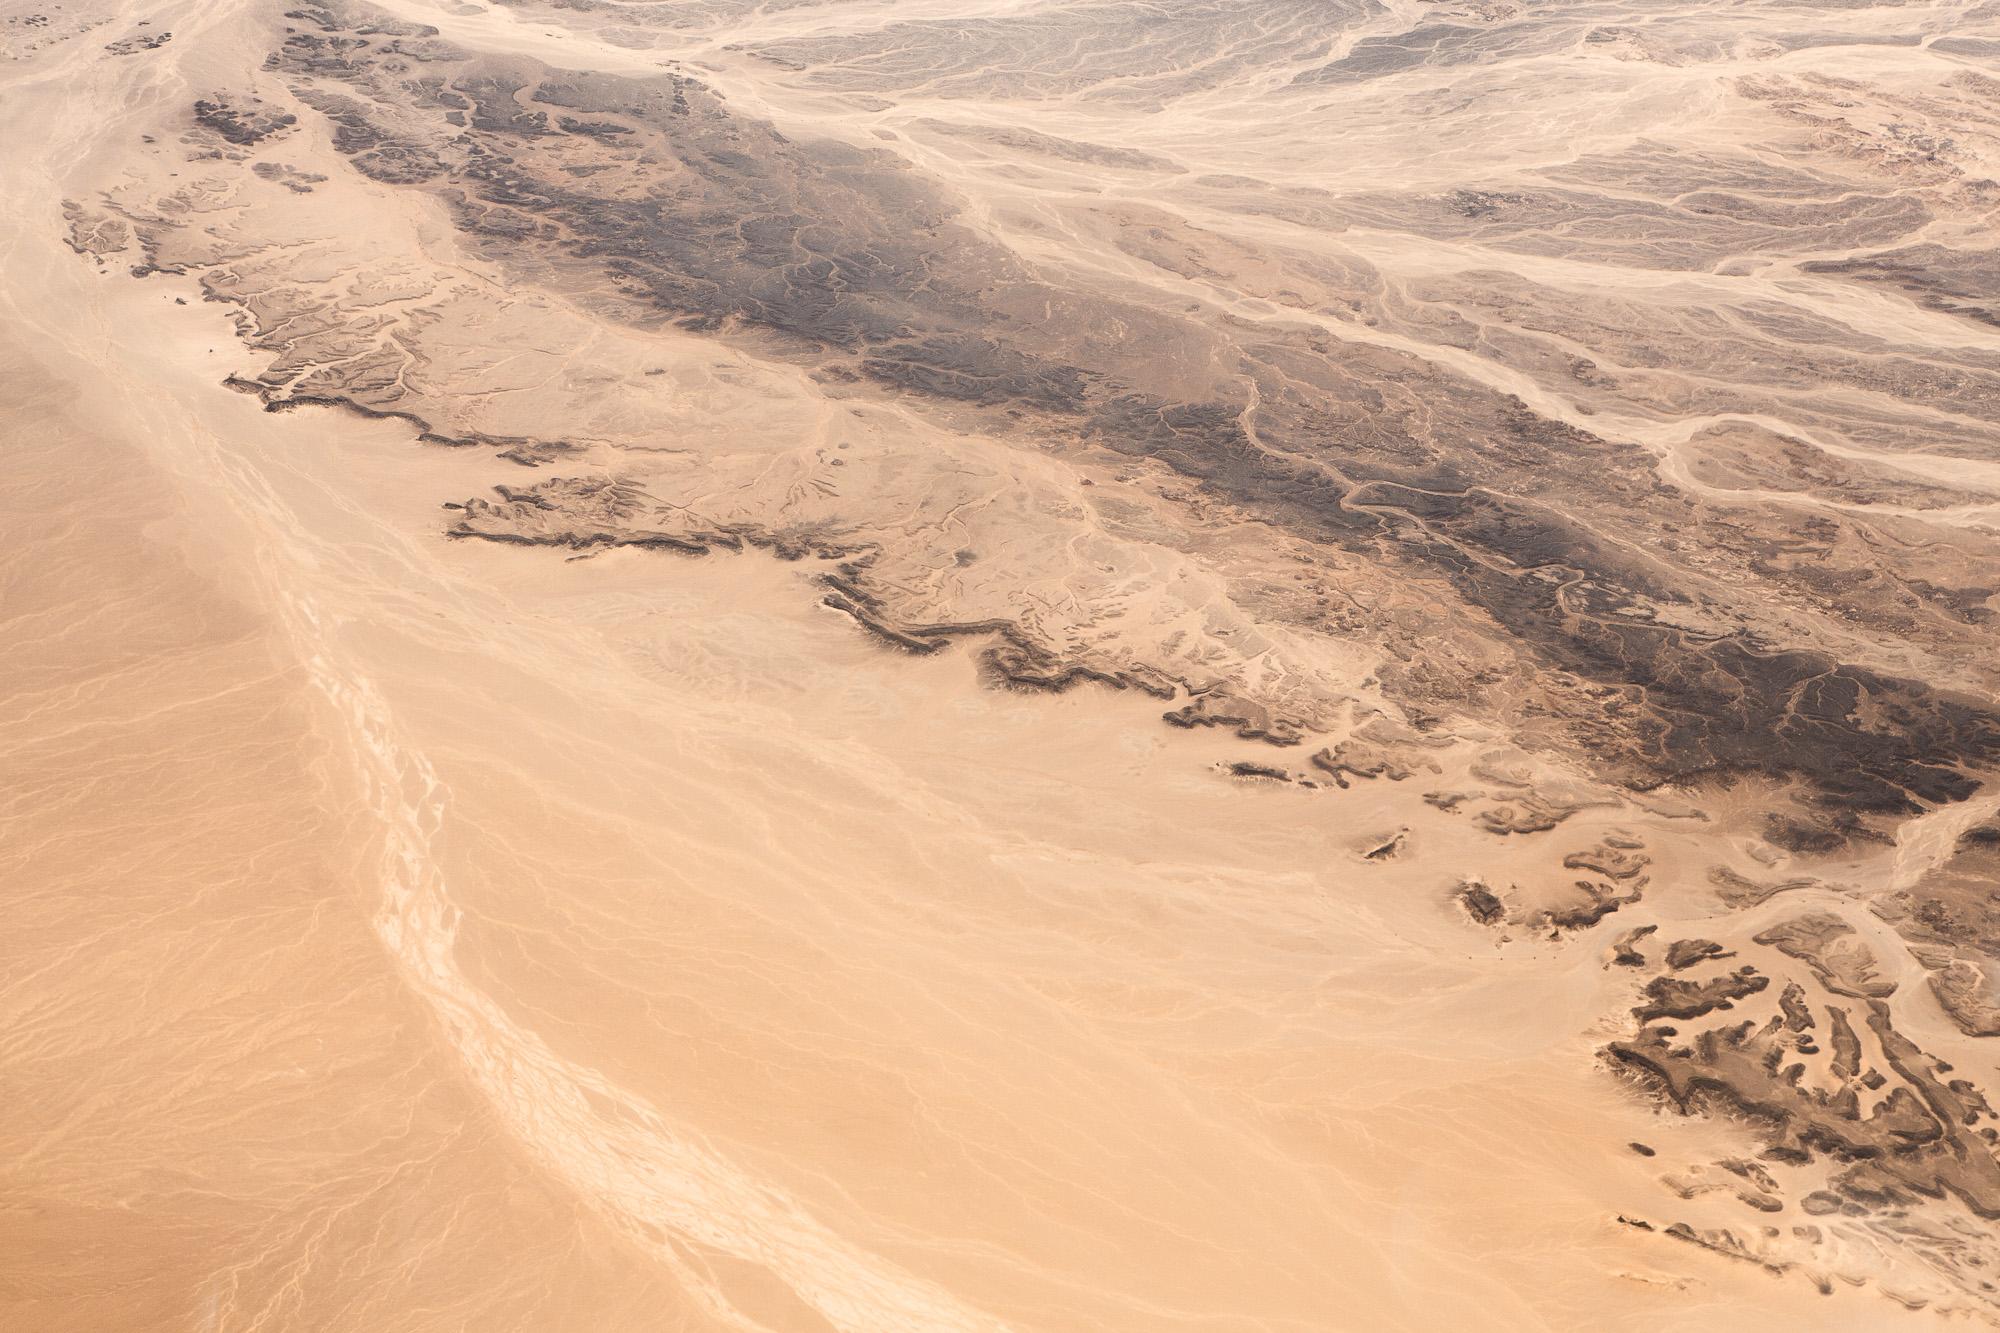 Deserts - Survey #4, 2015